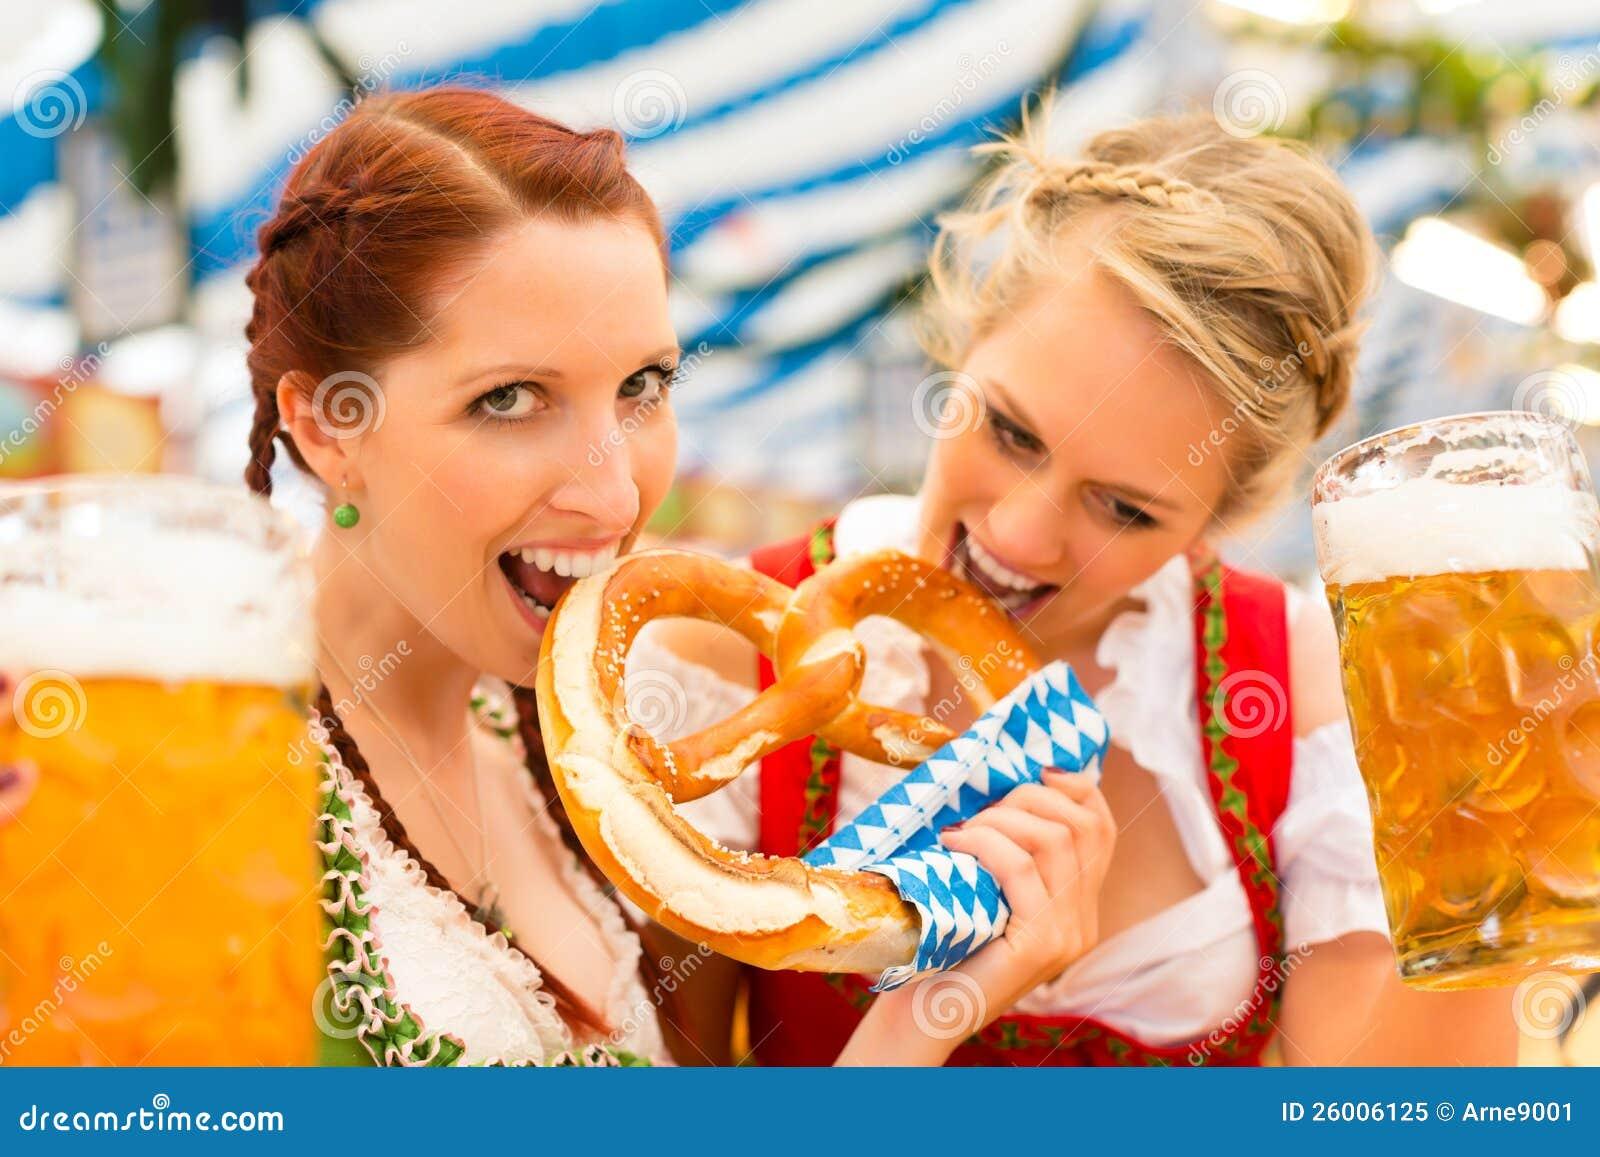 Women with Bavarian dirndl in beer tent